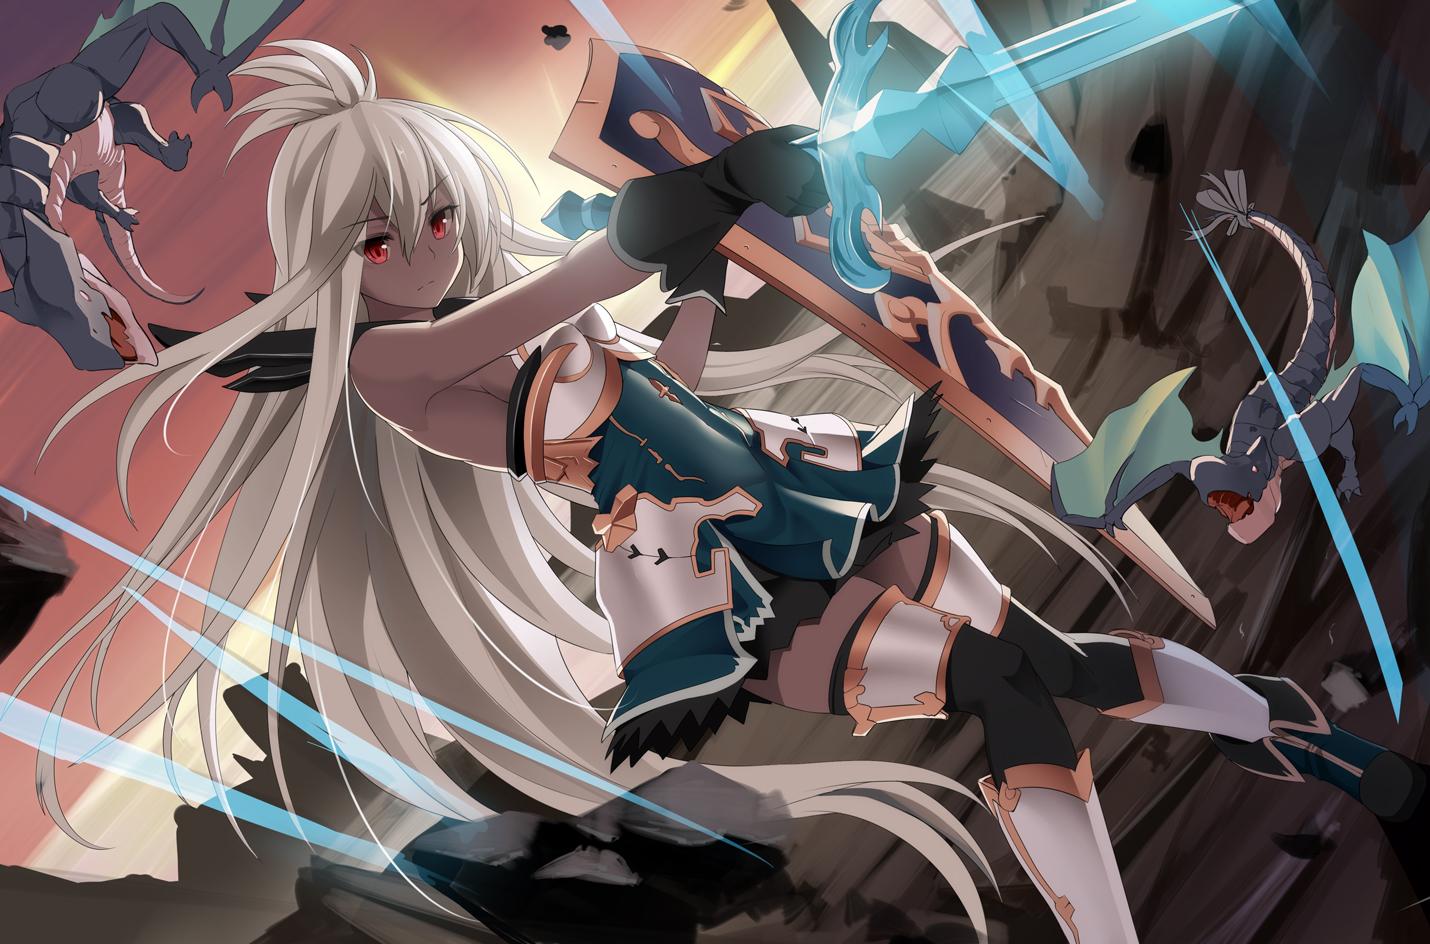 armor blonde_hair boots dark_skin dragon gloves granblue_fantasy hirame_sa long_hair magic red_eyes sideboob sunset sword tagme_(character) thighhighs weapon